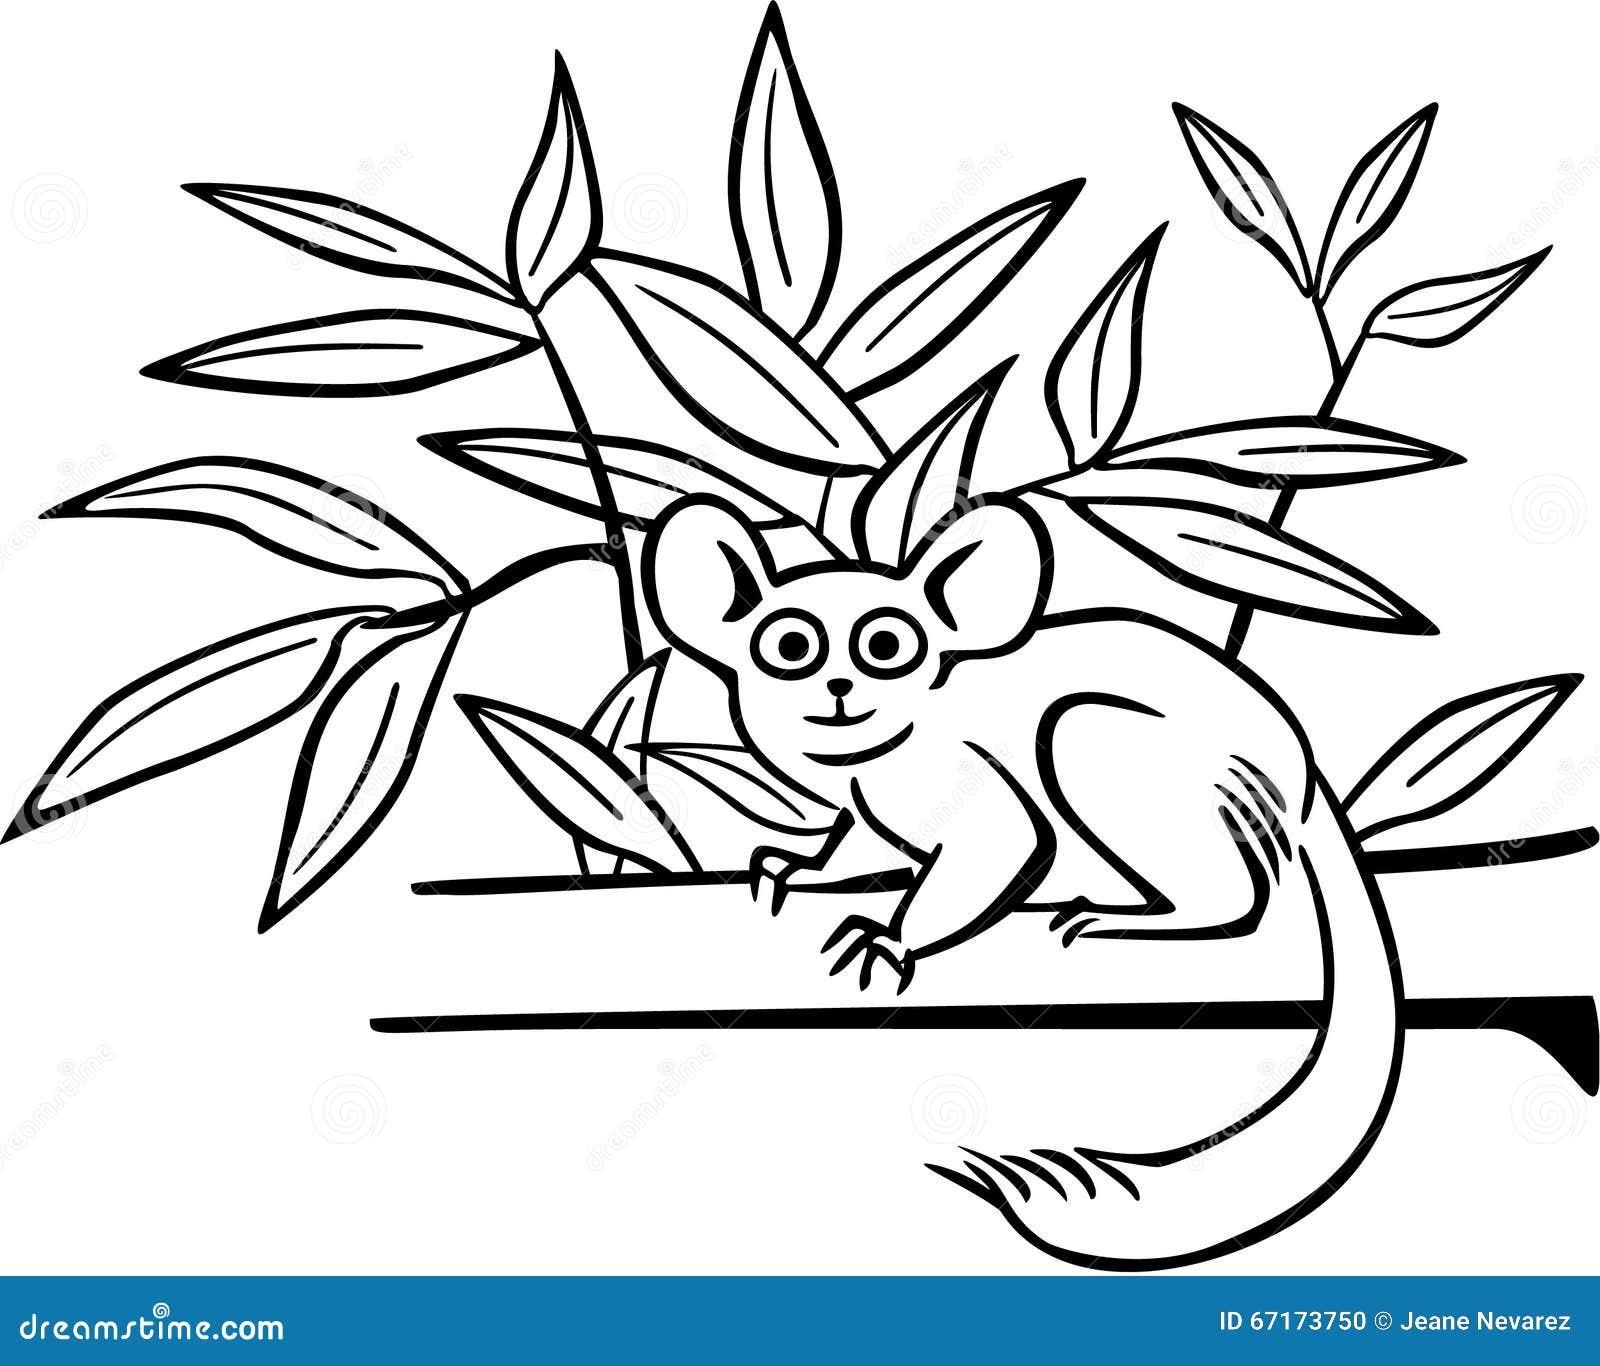 Bushbaby on a Branch stock vector. Illustration of branch ...